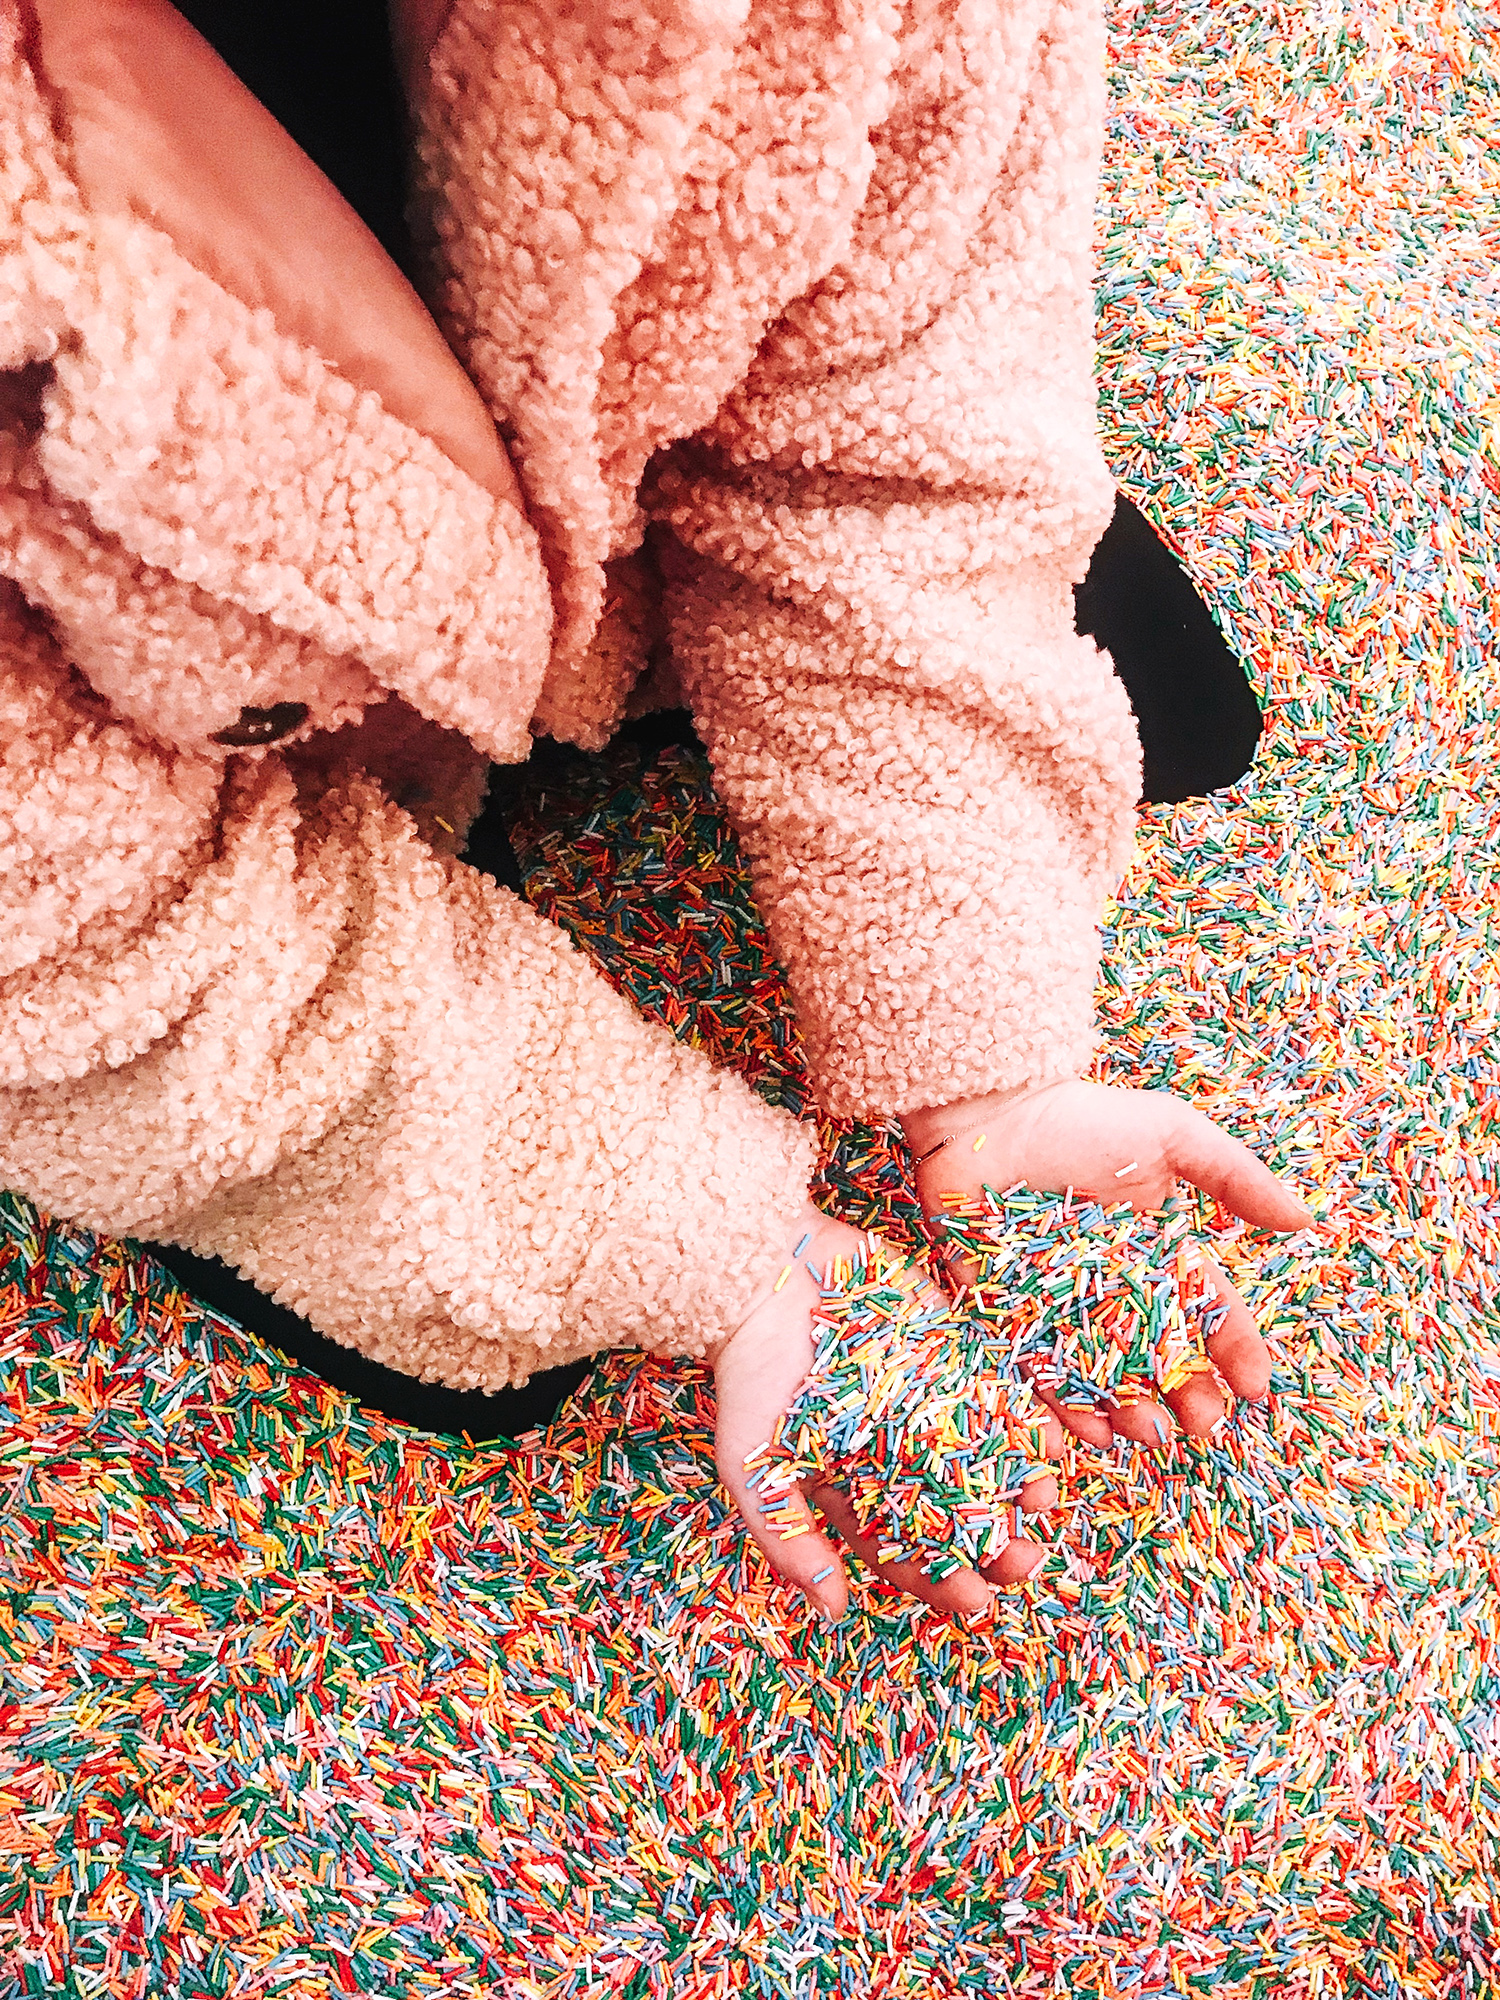 san francisco museum of ice cream girl in pool of sprinkles